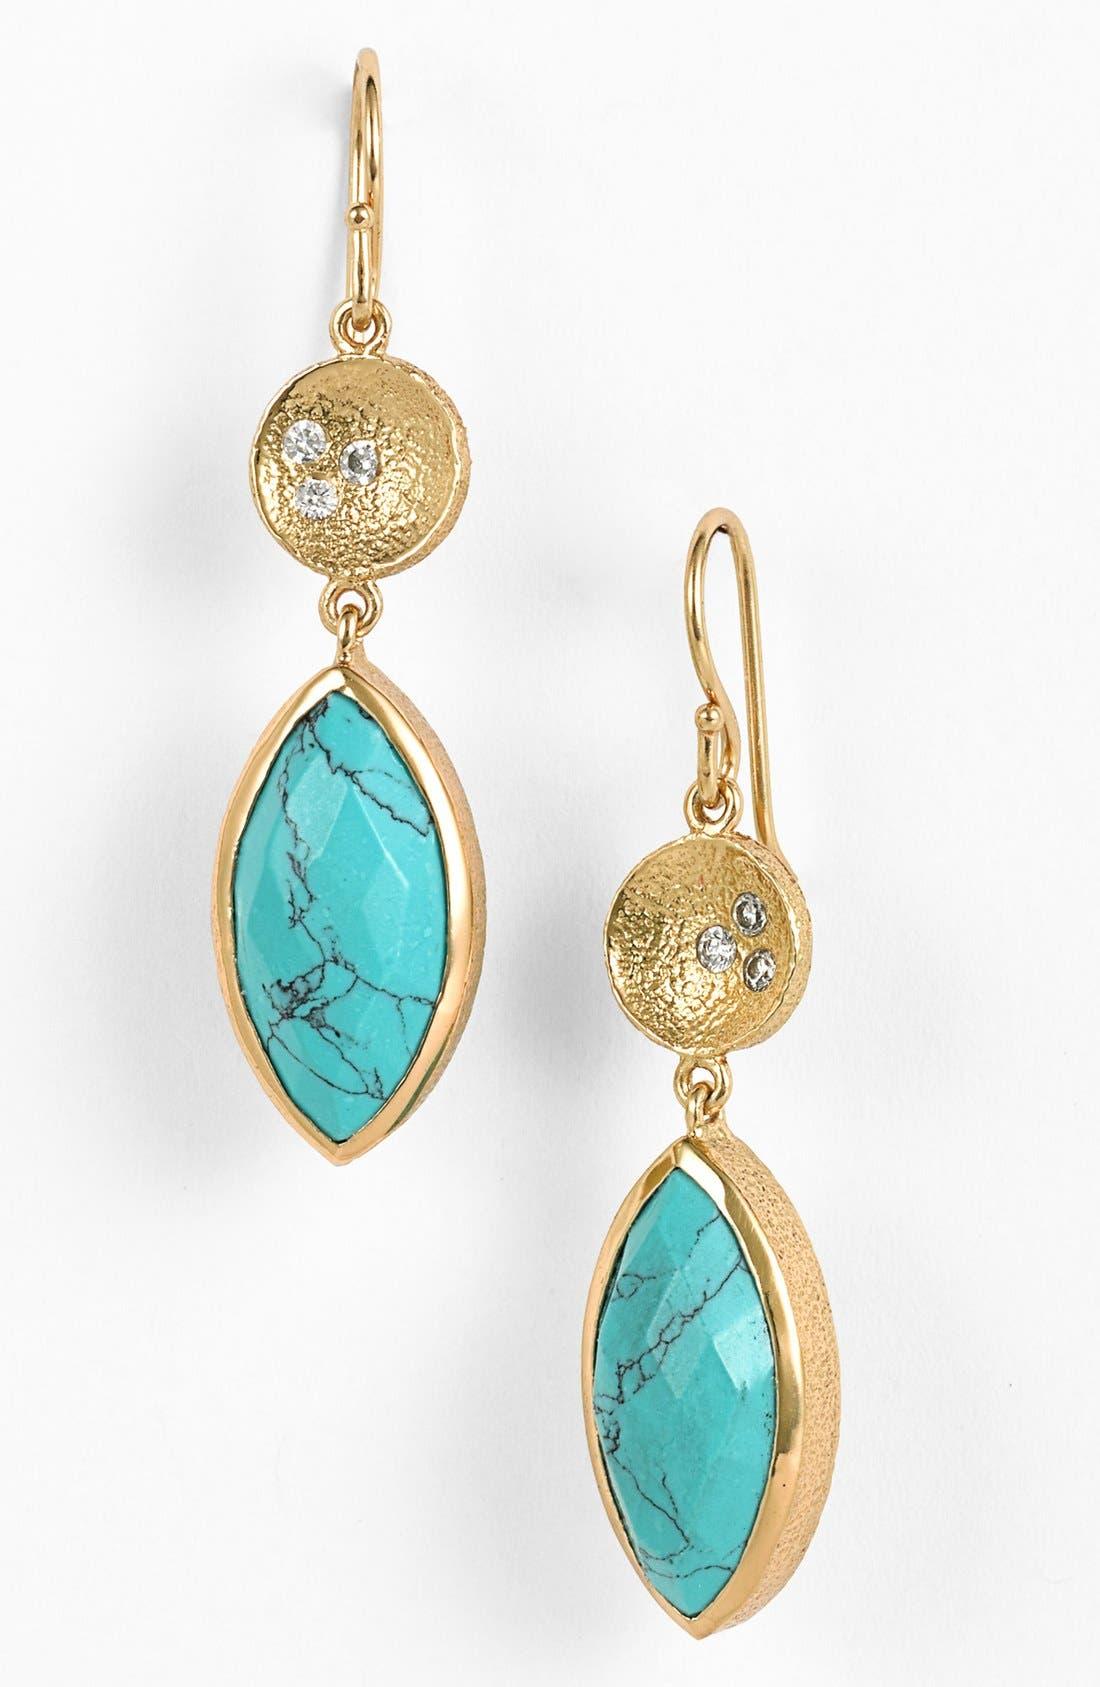 Alternate Image 1 Selected - Melinda Maria 'Dory' Drop Earrings